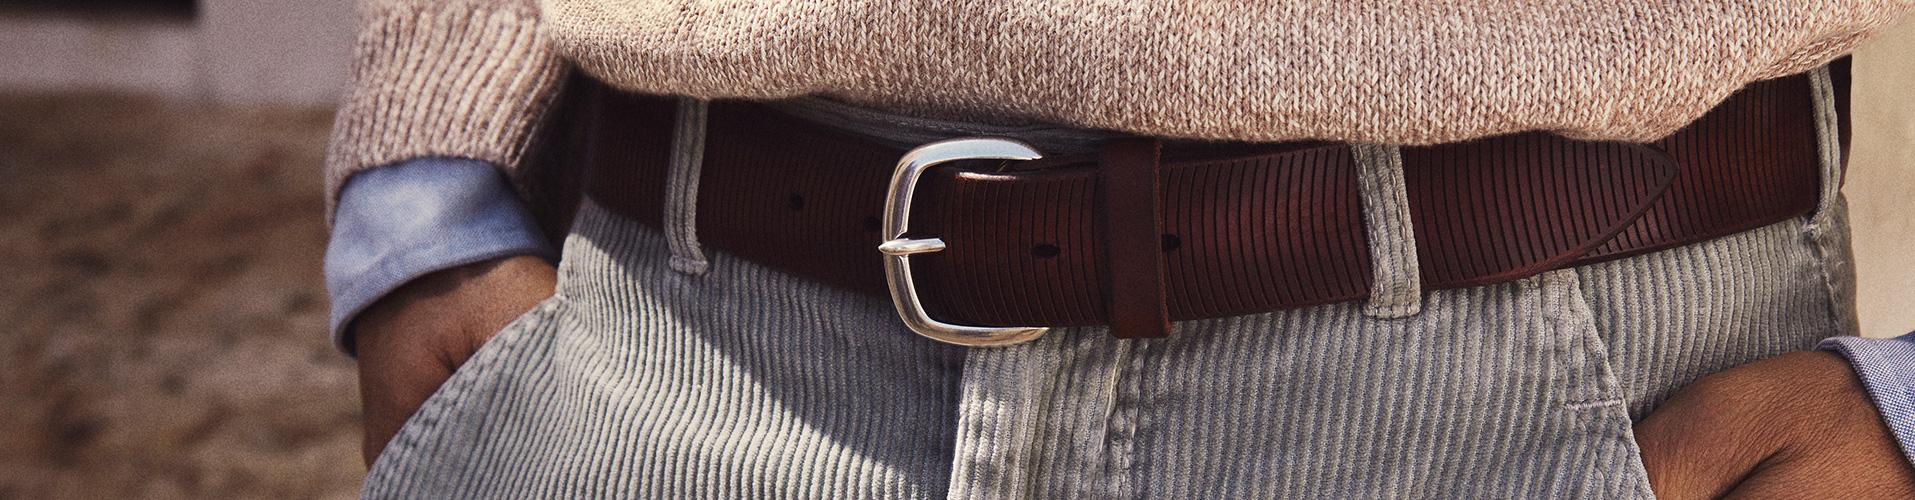 ORCIANI | Man's Belts collection. Leather Belts | Shop online